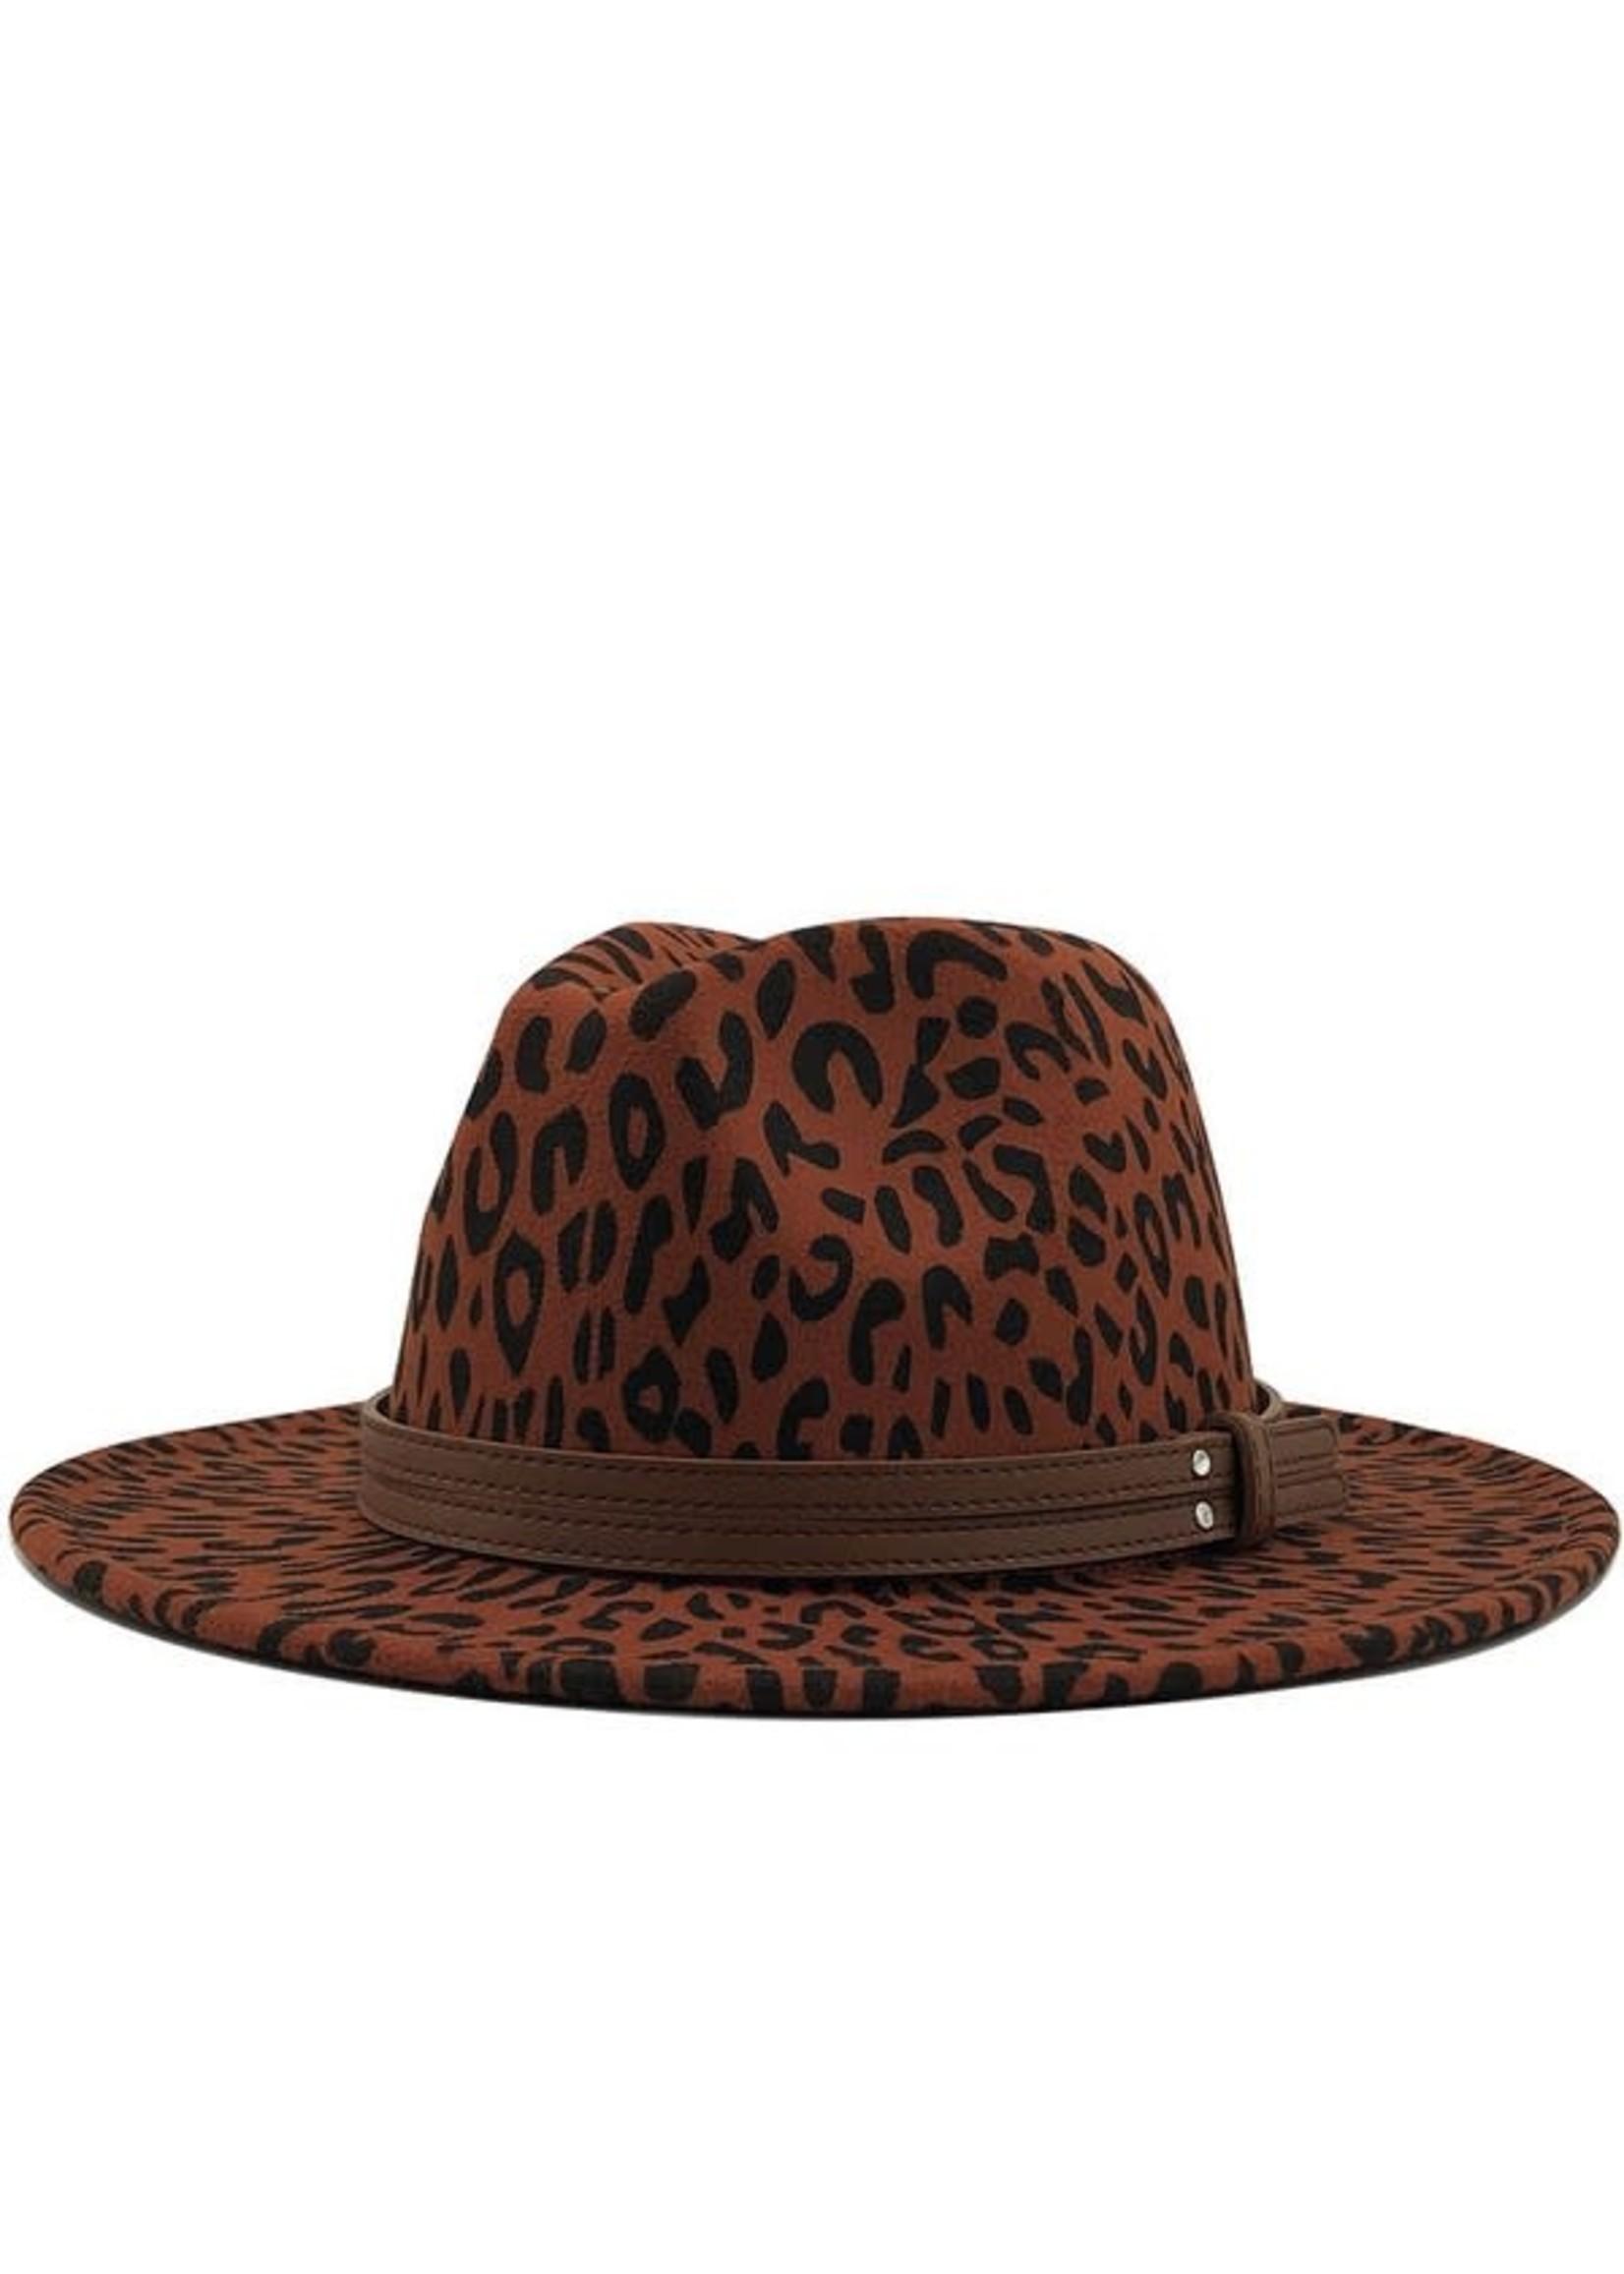 Leopard Stylish Panama Hat